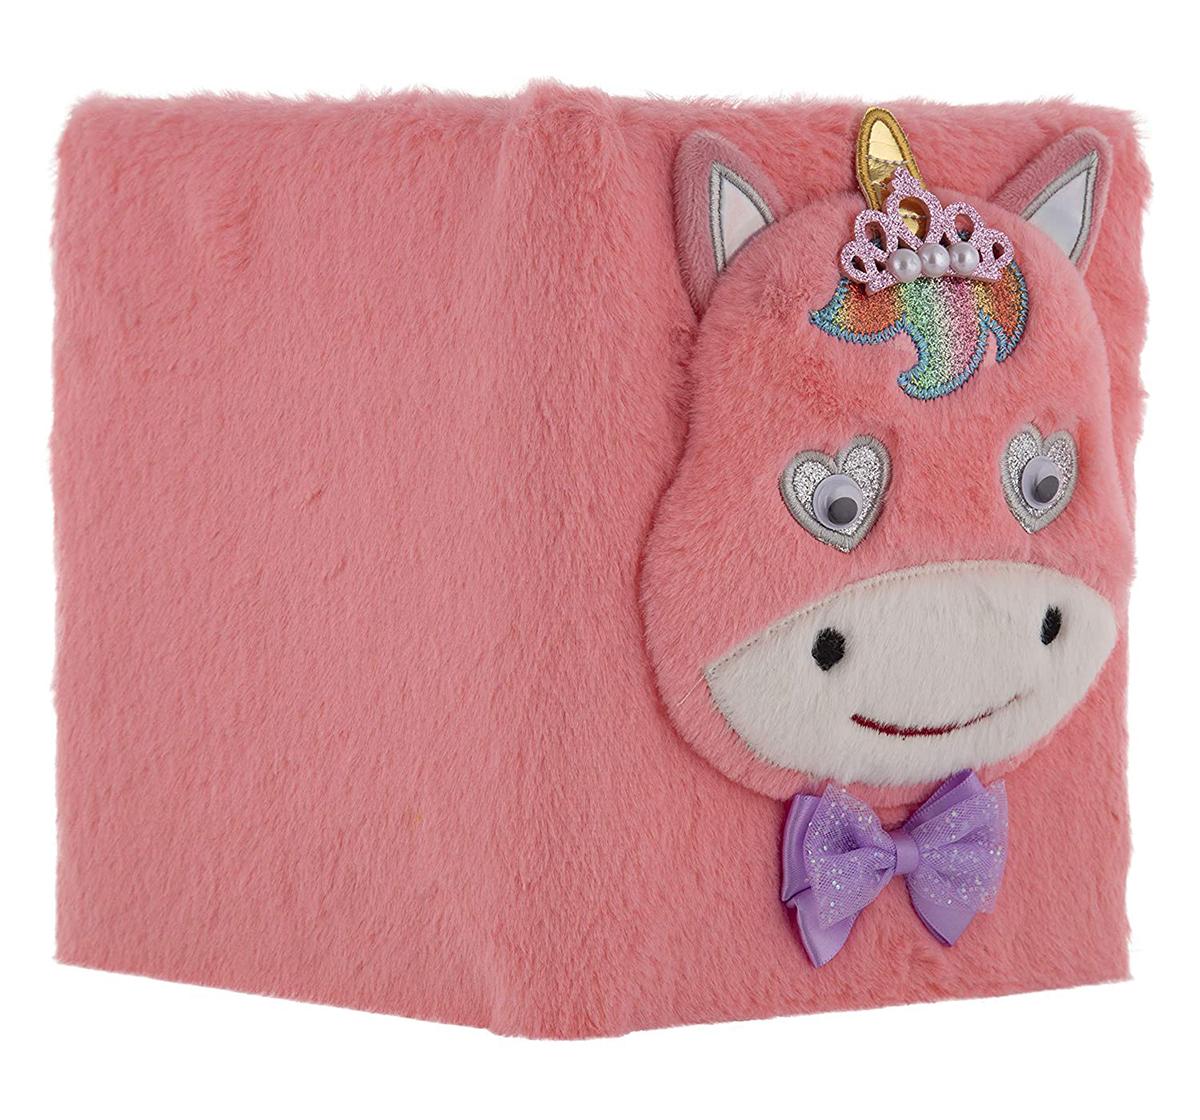 Mirada | Mirada Princess Bella Plush Study & Desk Accessories for Kids age 3Y+ (Pink)